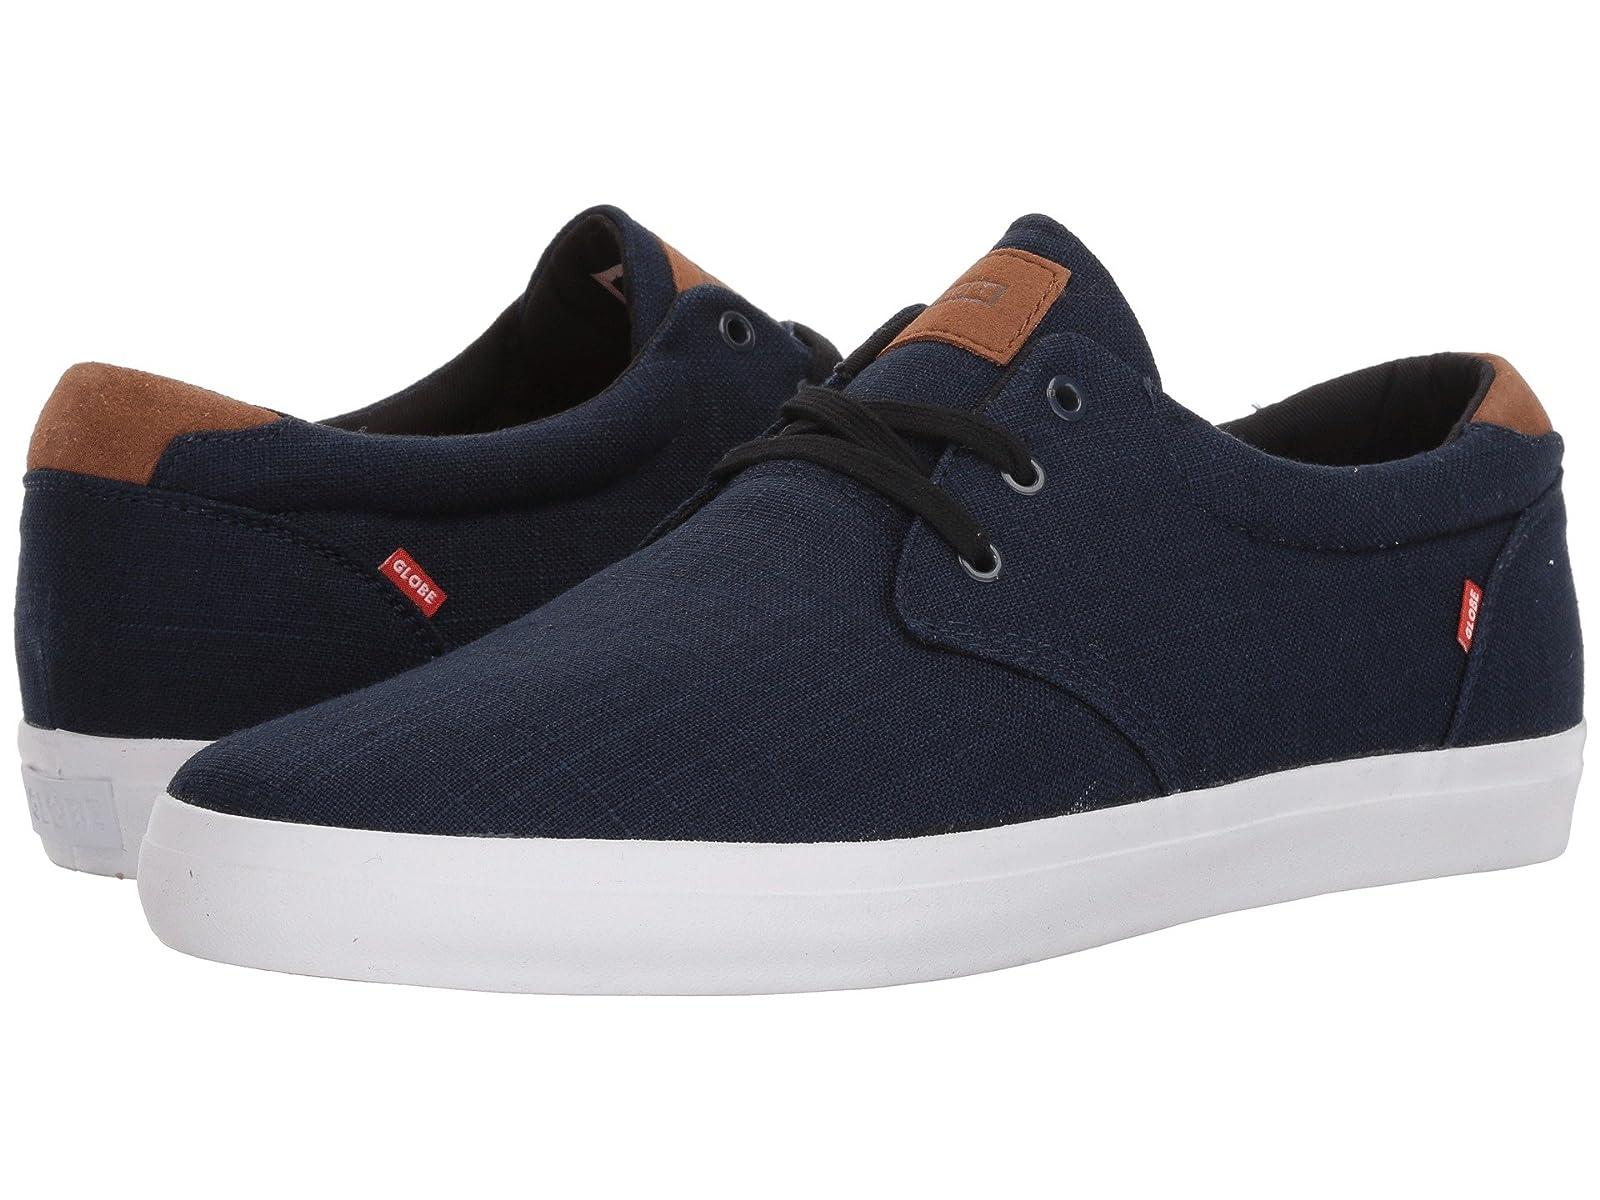 Globe WinslowCheap and distinctive eye-catching shoes